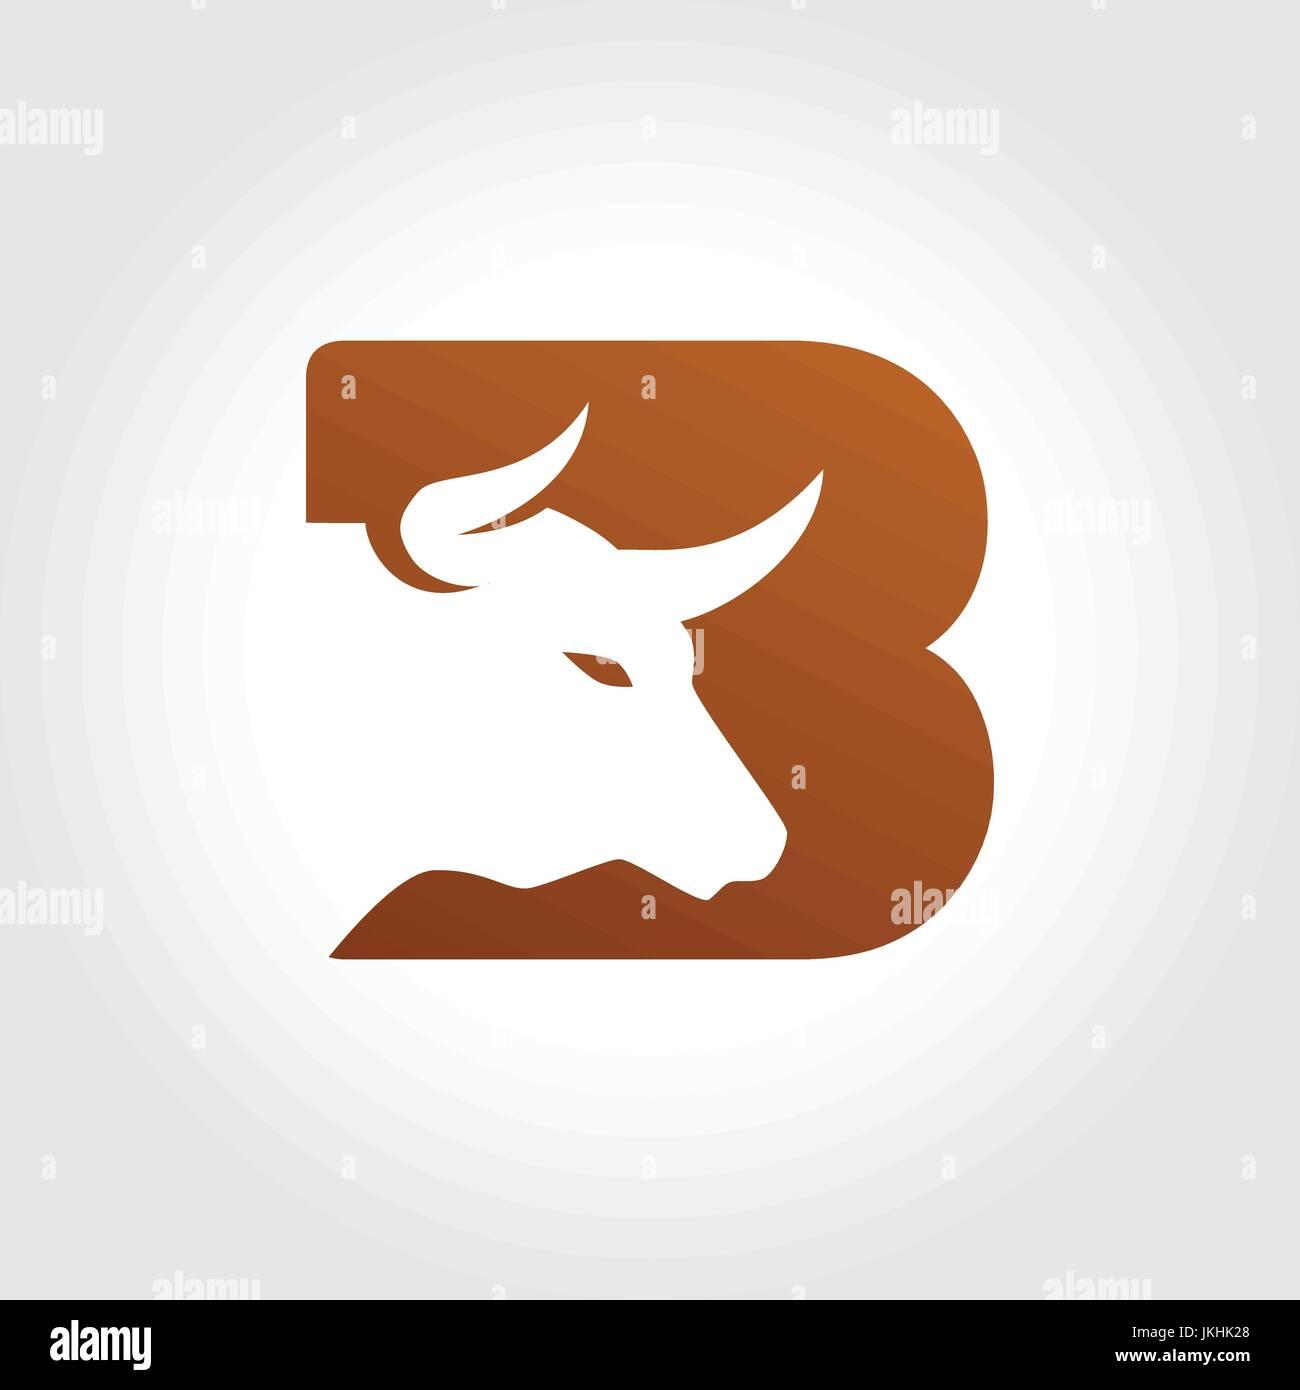 Letter B Symbol with Bull Head Silhouette Design Stock Vector Art